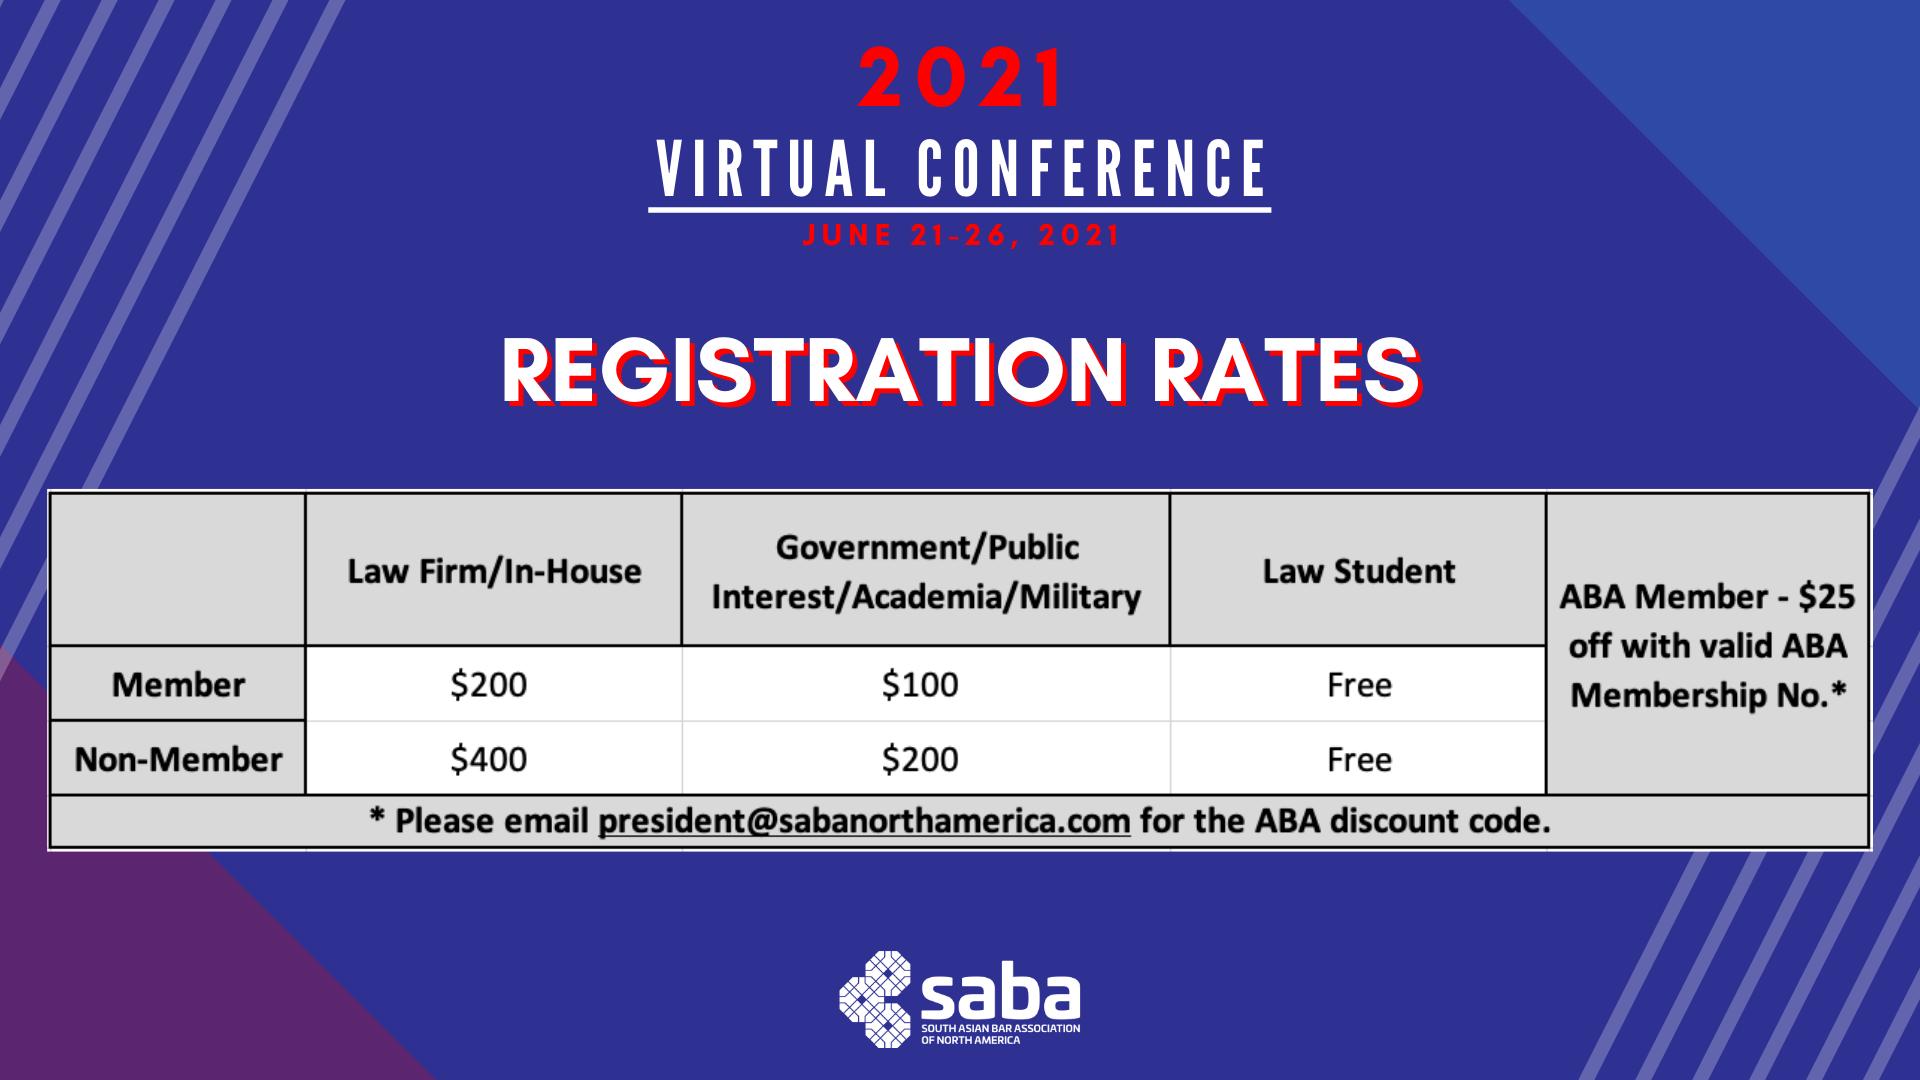 Updated Registration Rates